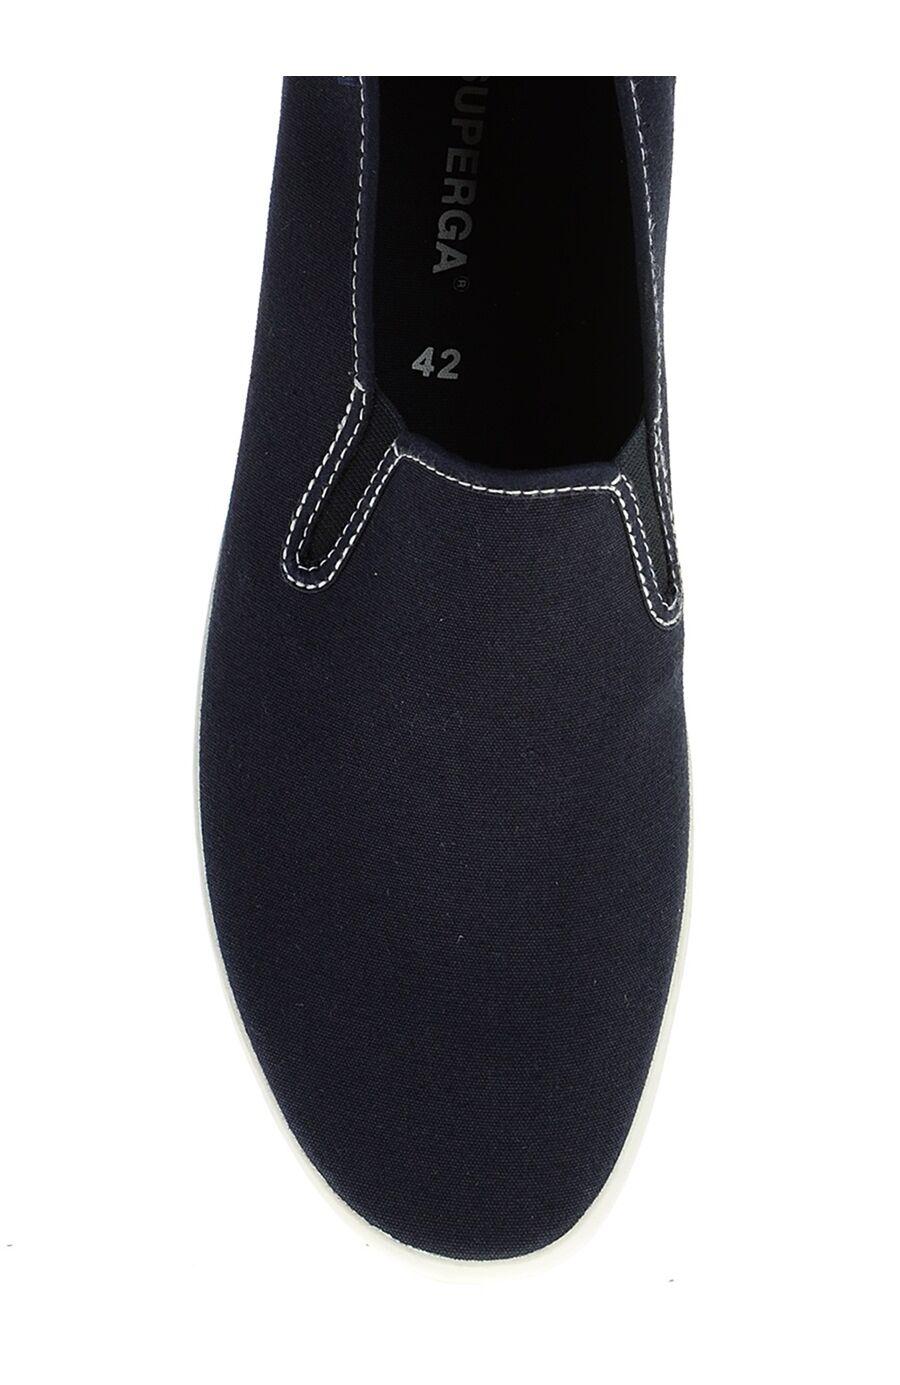 Lacivert Keten Slipper Ayakkabı